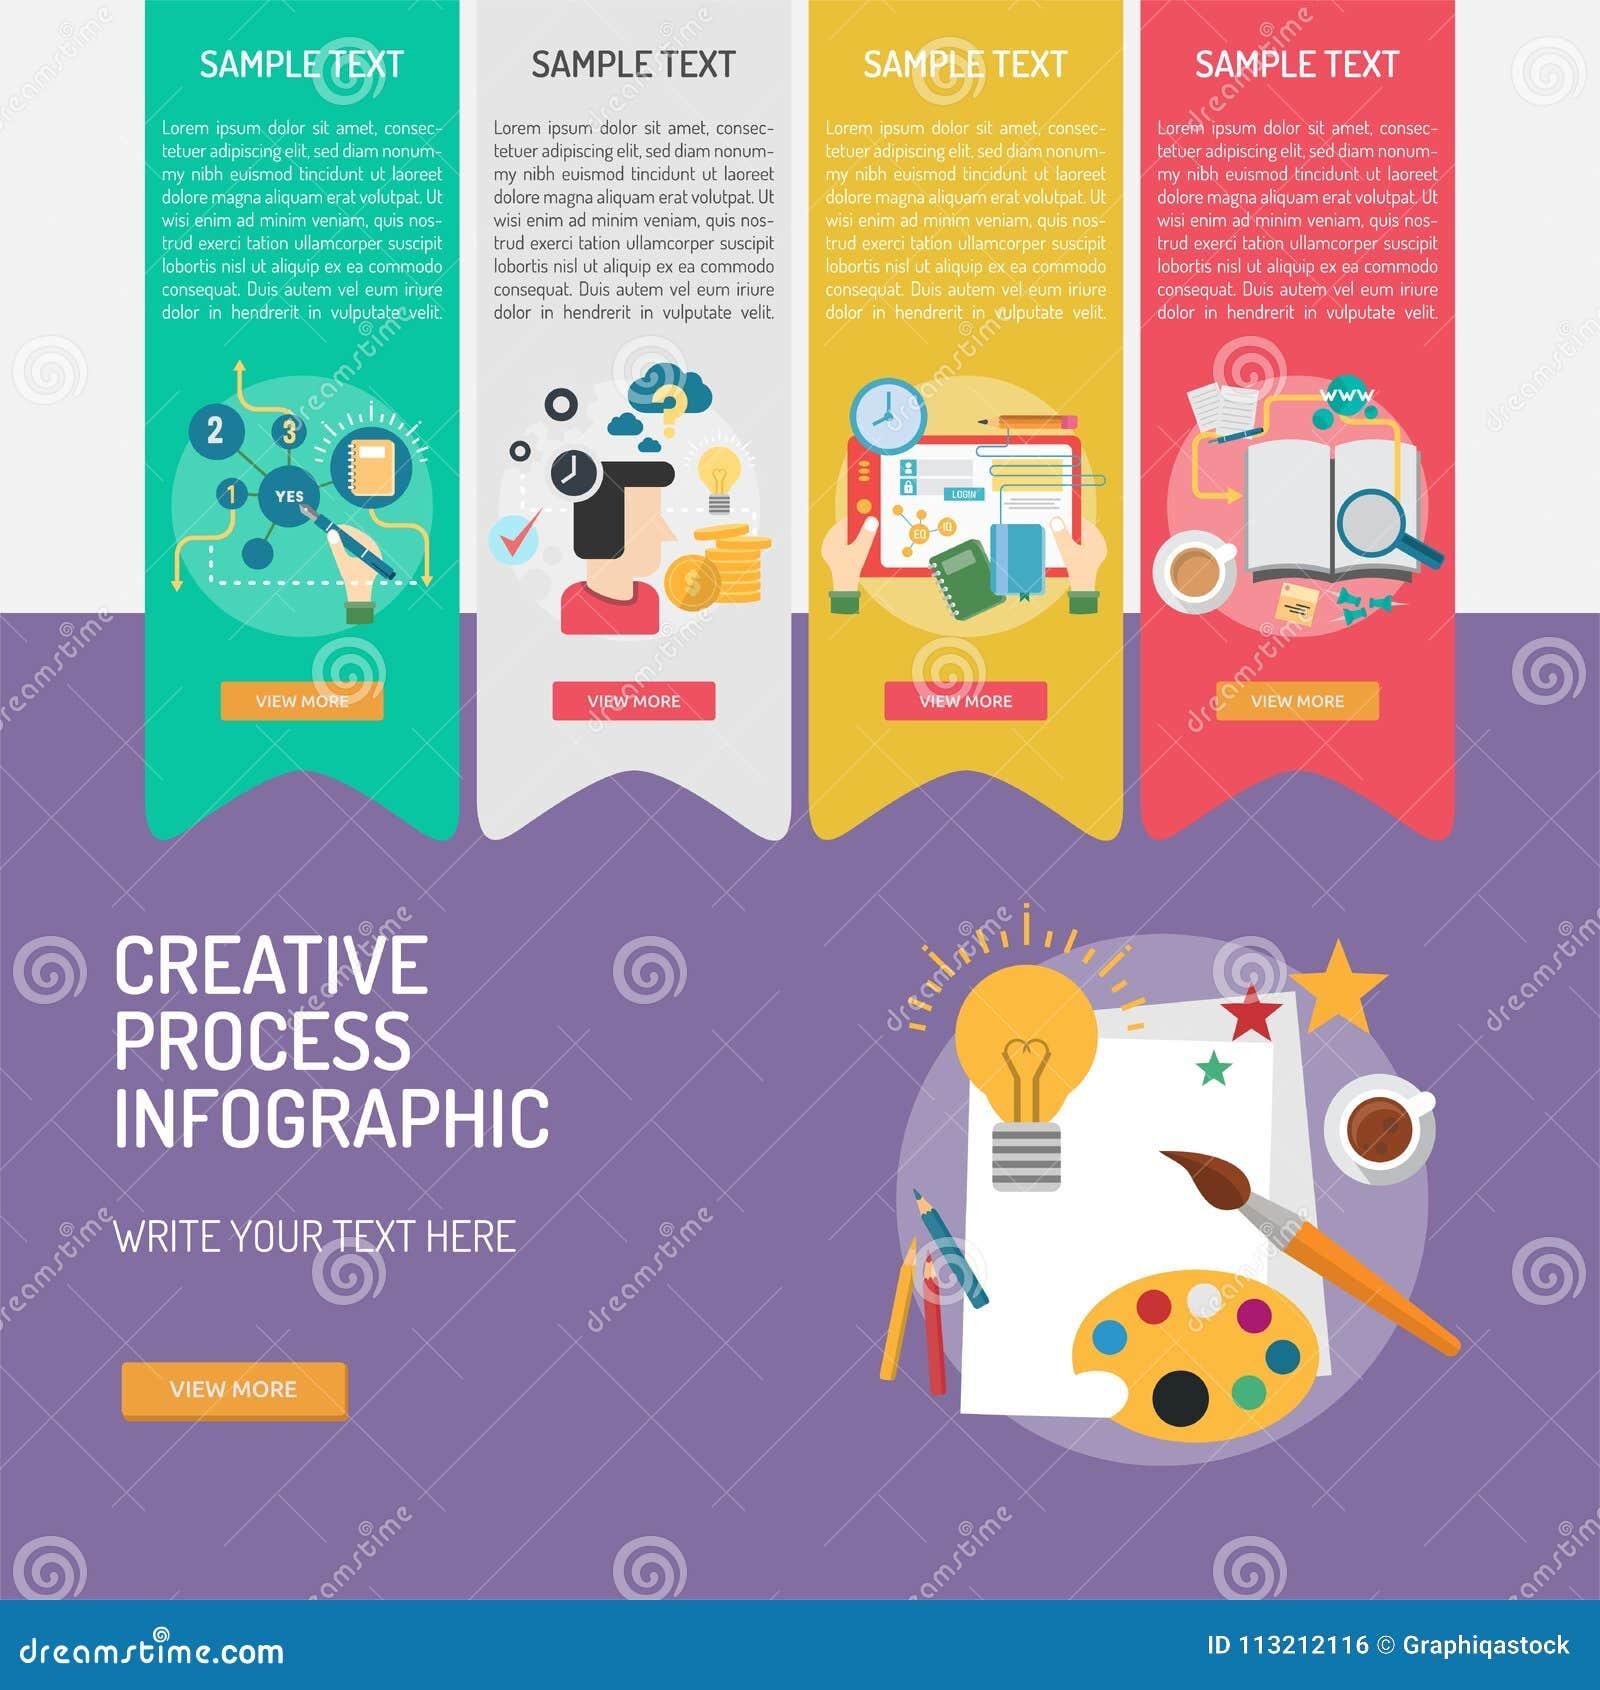 Creative Process Infographic Complex Stock Illustration ...